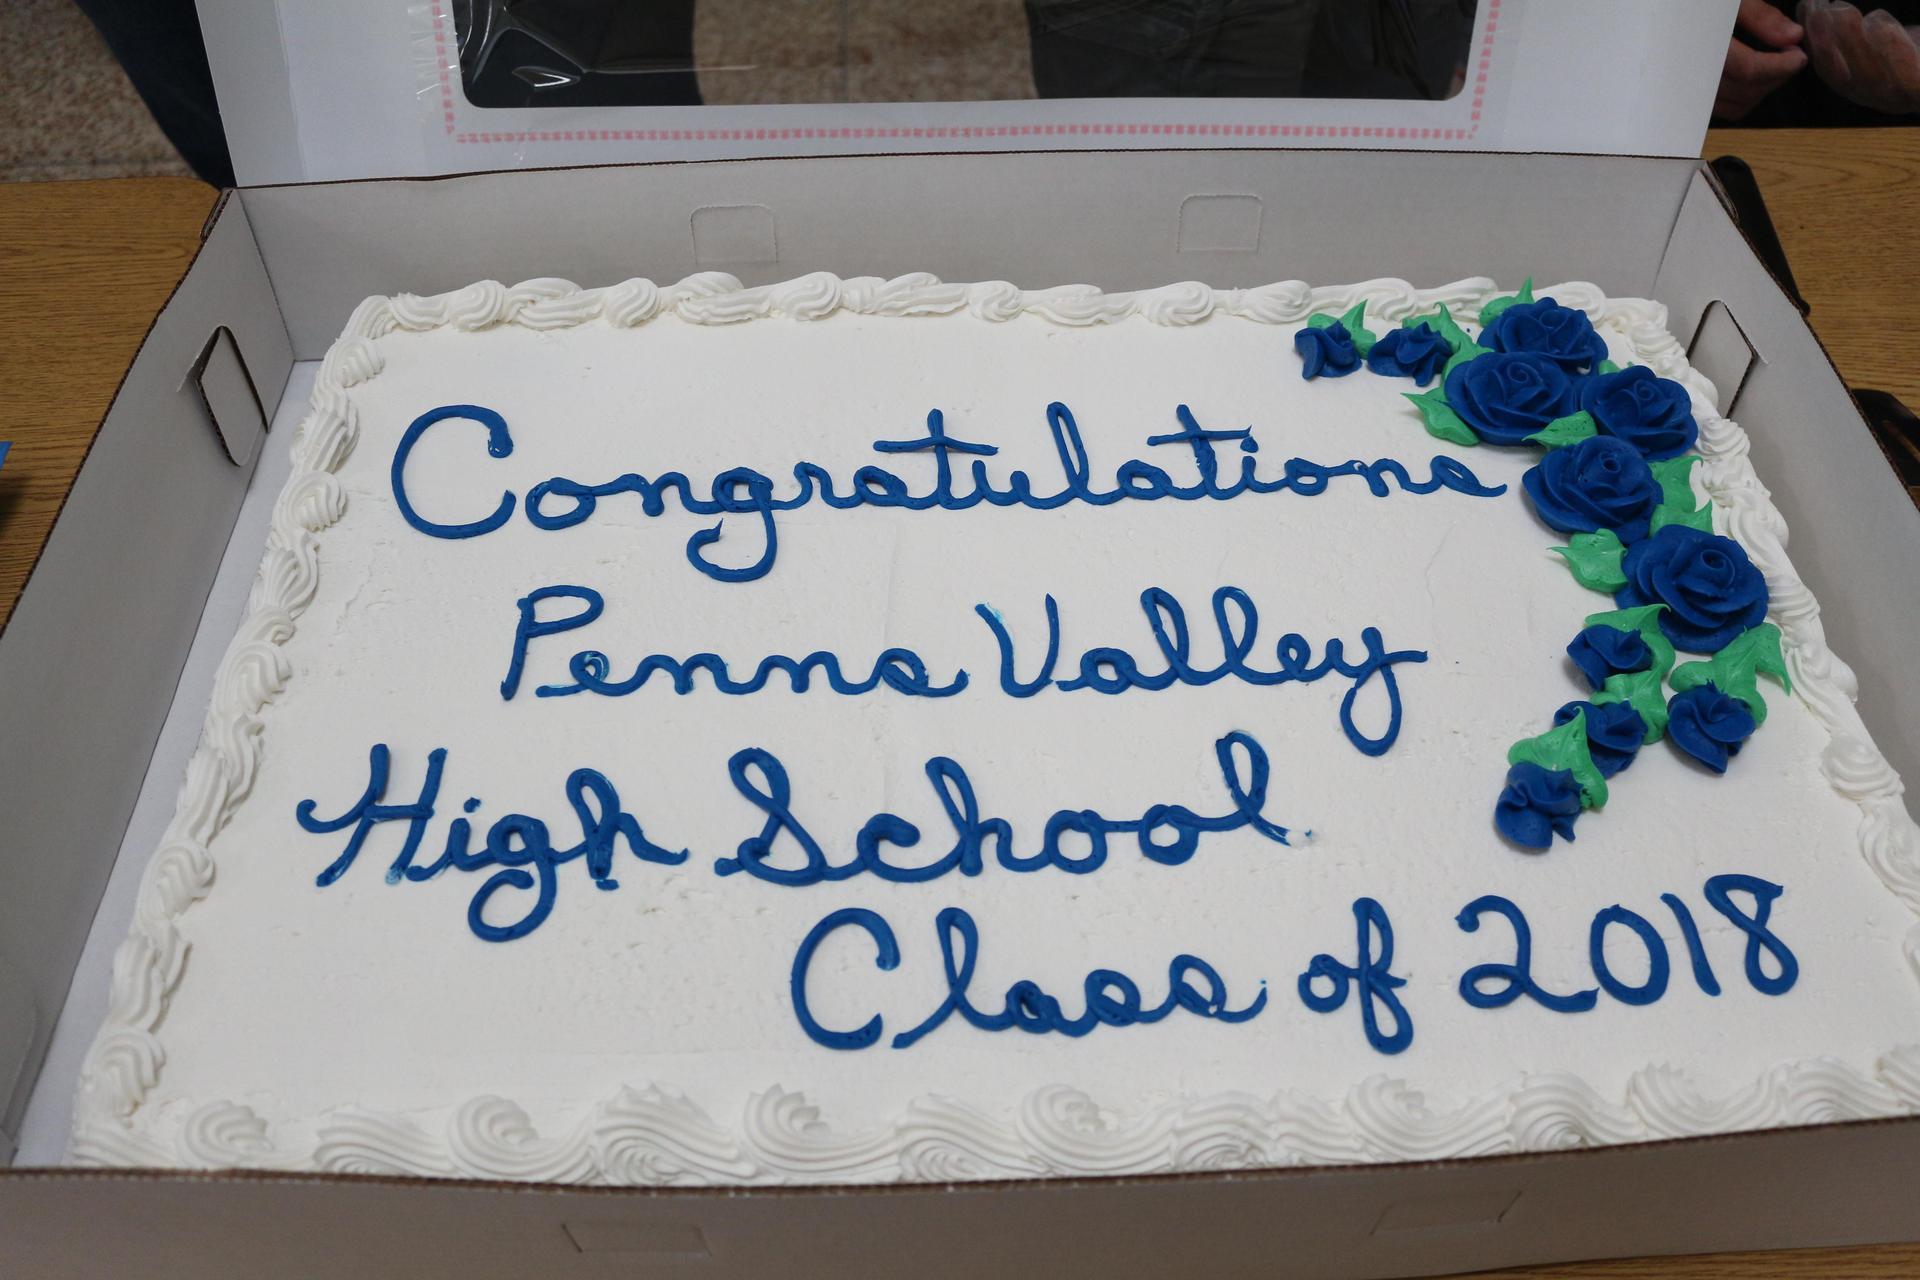 class of 2018 congratulations cake